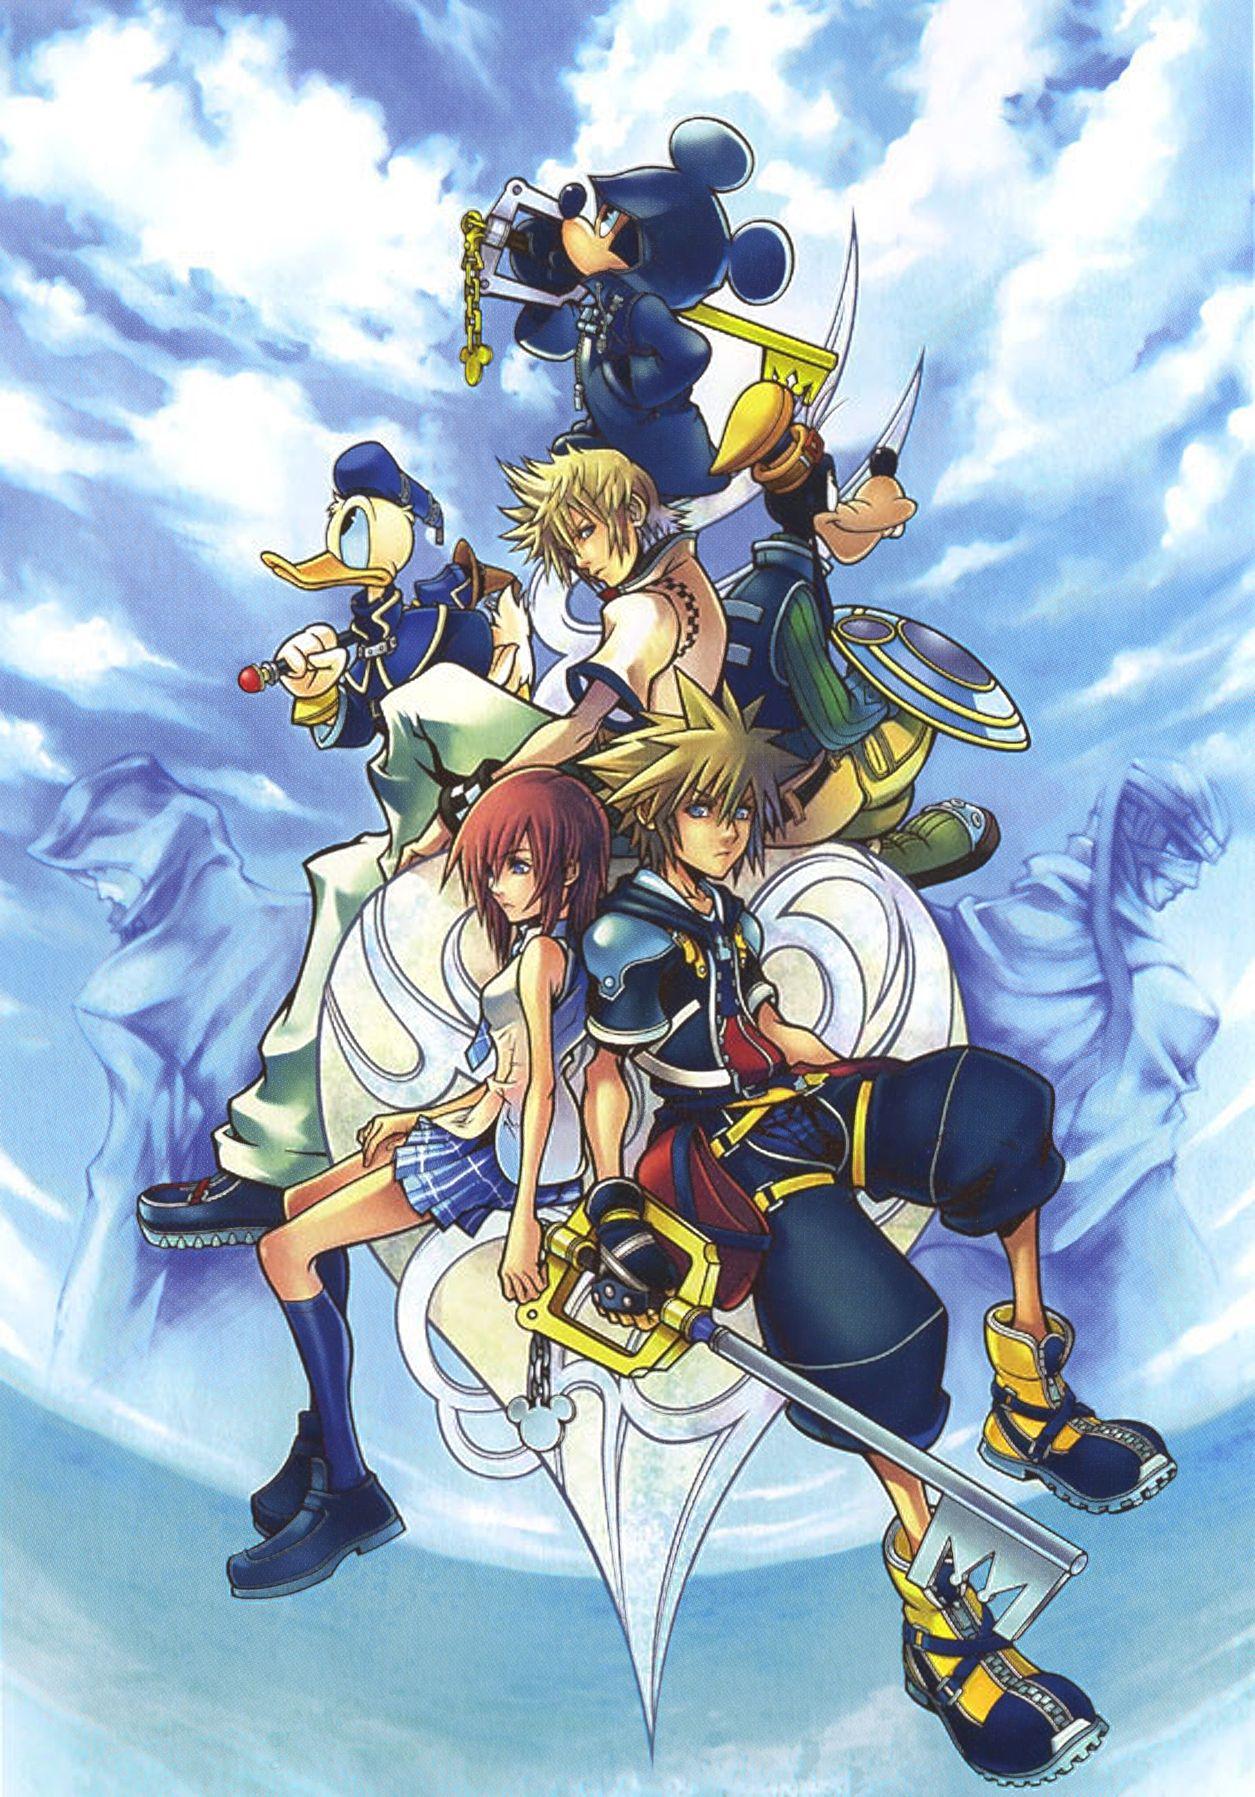 Kingdom Hearts Ii Kingdom Hearts Wallpaper Kingdom Hearts Ii Kingdom Hearts